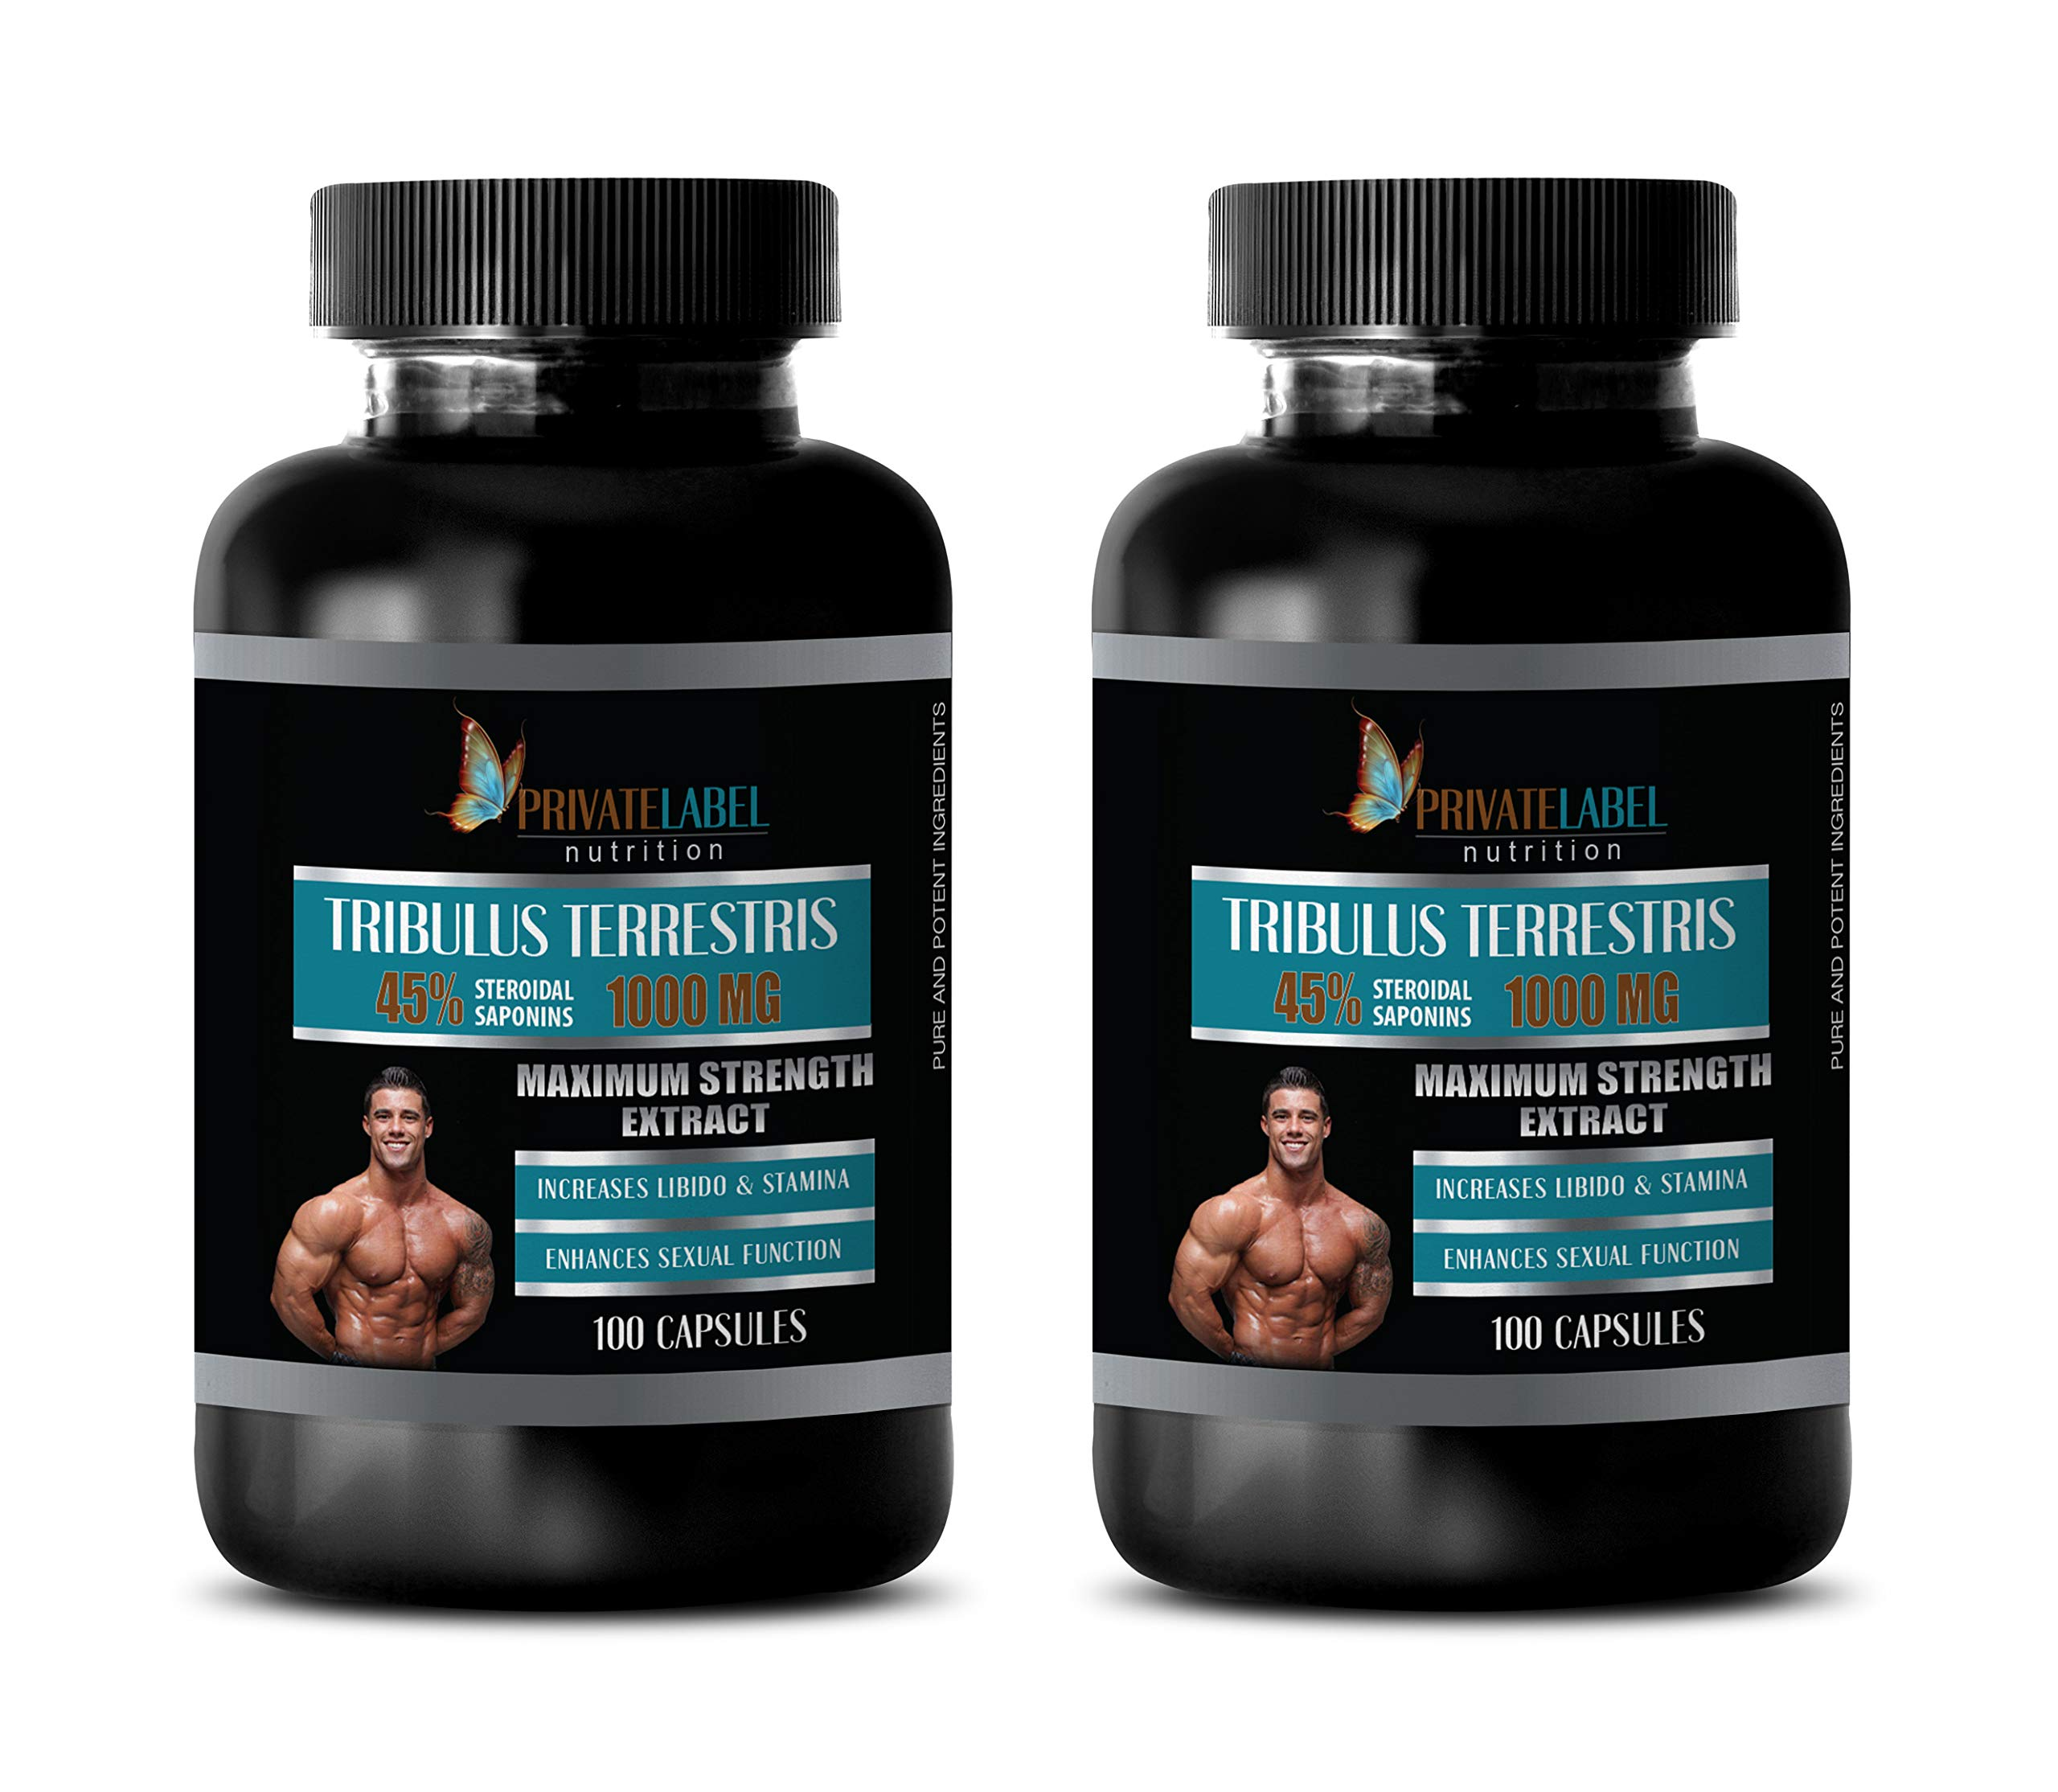 Testosterone Booster libido for Men - TRIBULUS TERRESTRIS 45% STEROIDAL SAPONINS 1000MG - Maximum Strength Extract - tribulus Strength - 2 Bottles 200 Capsules